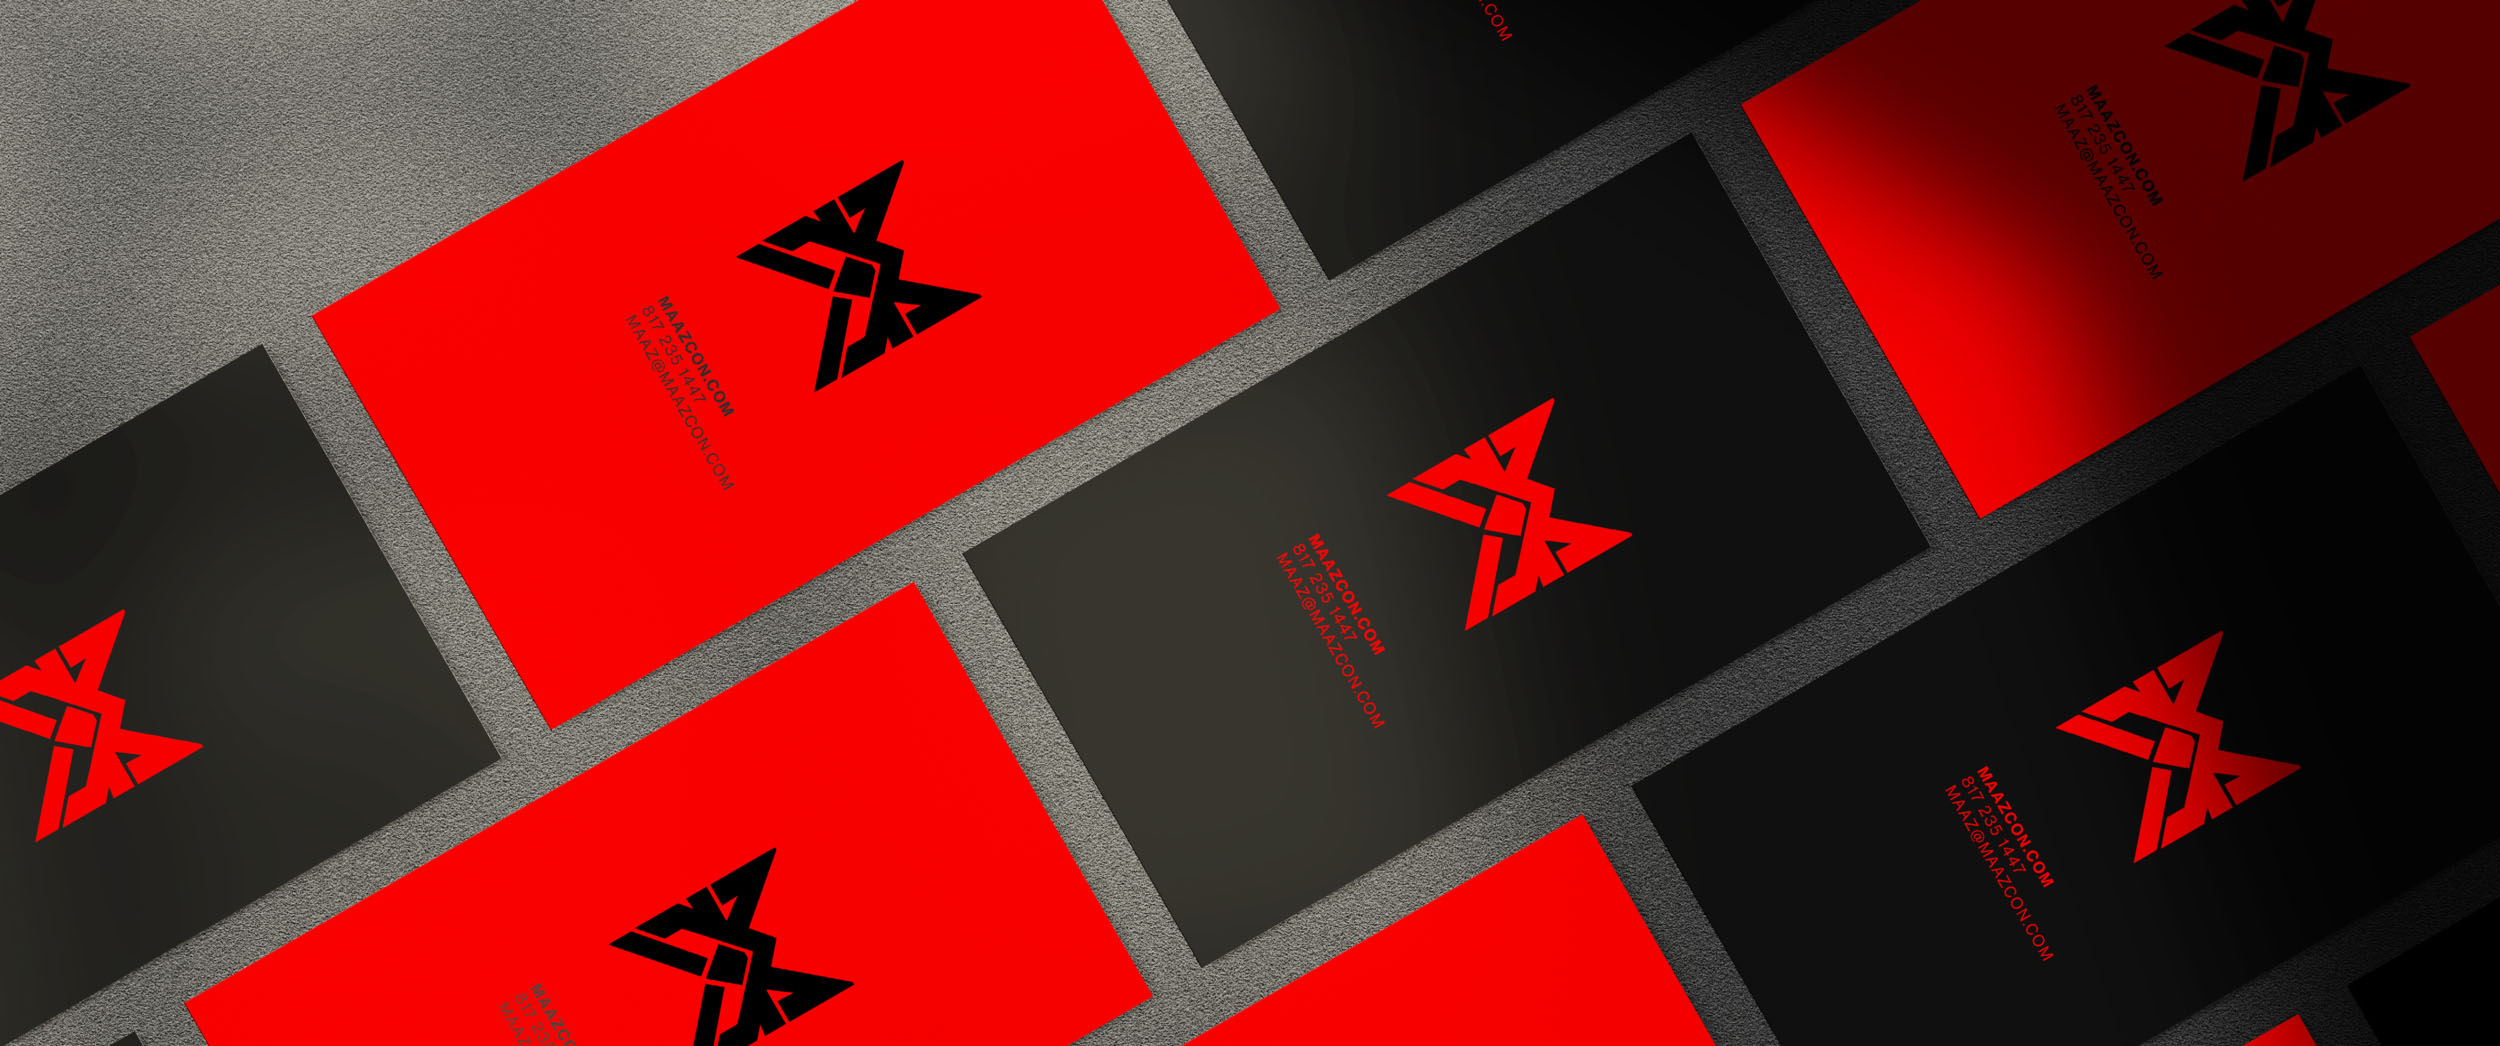 Personal Branding - (In Progress)